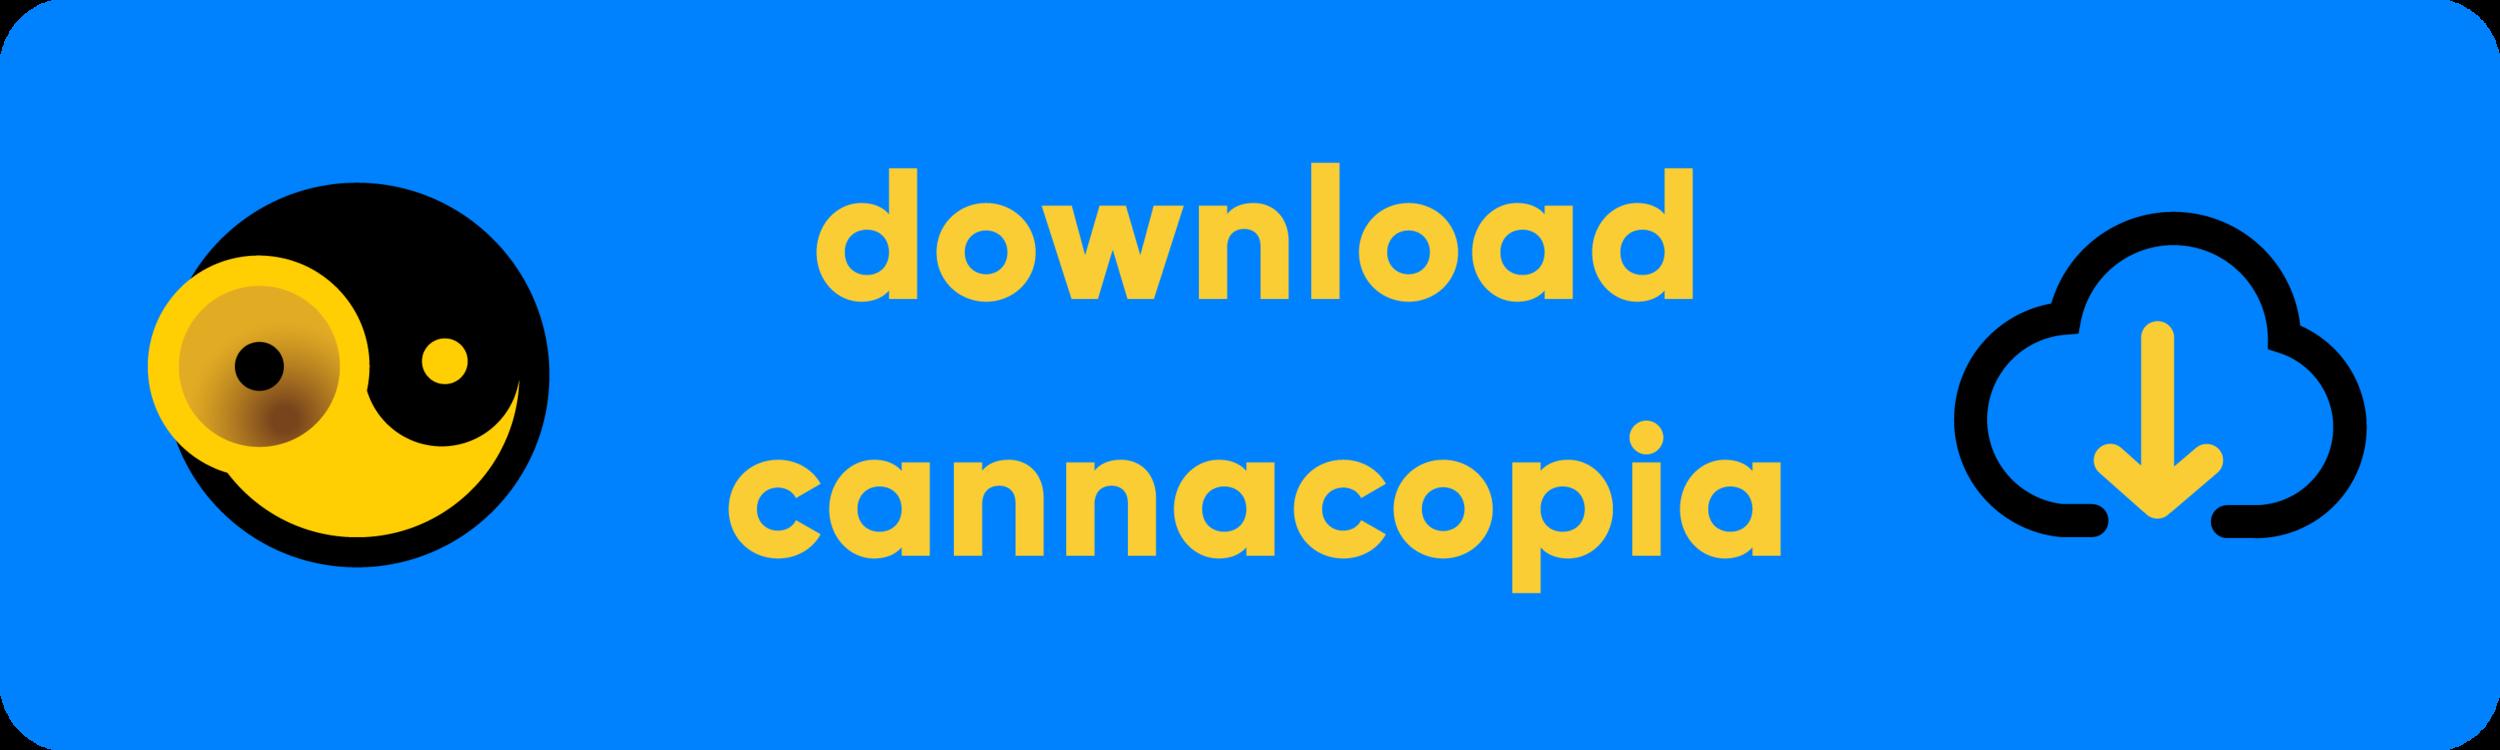 downloadcanna-04.png